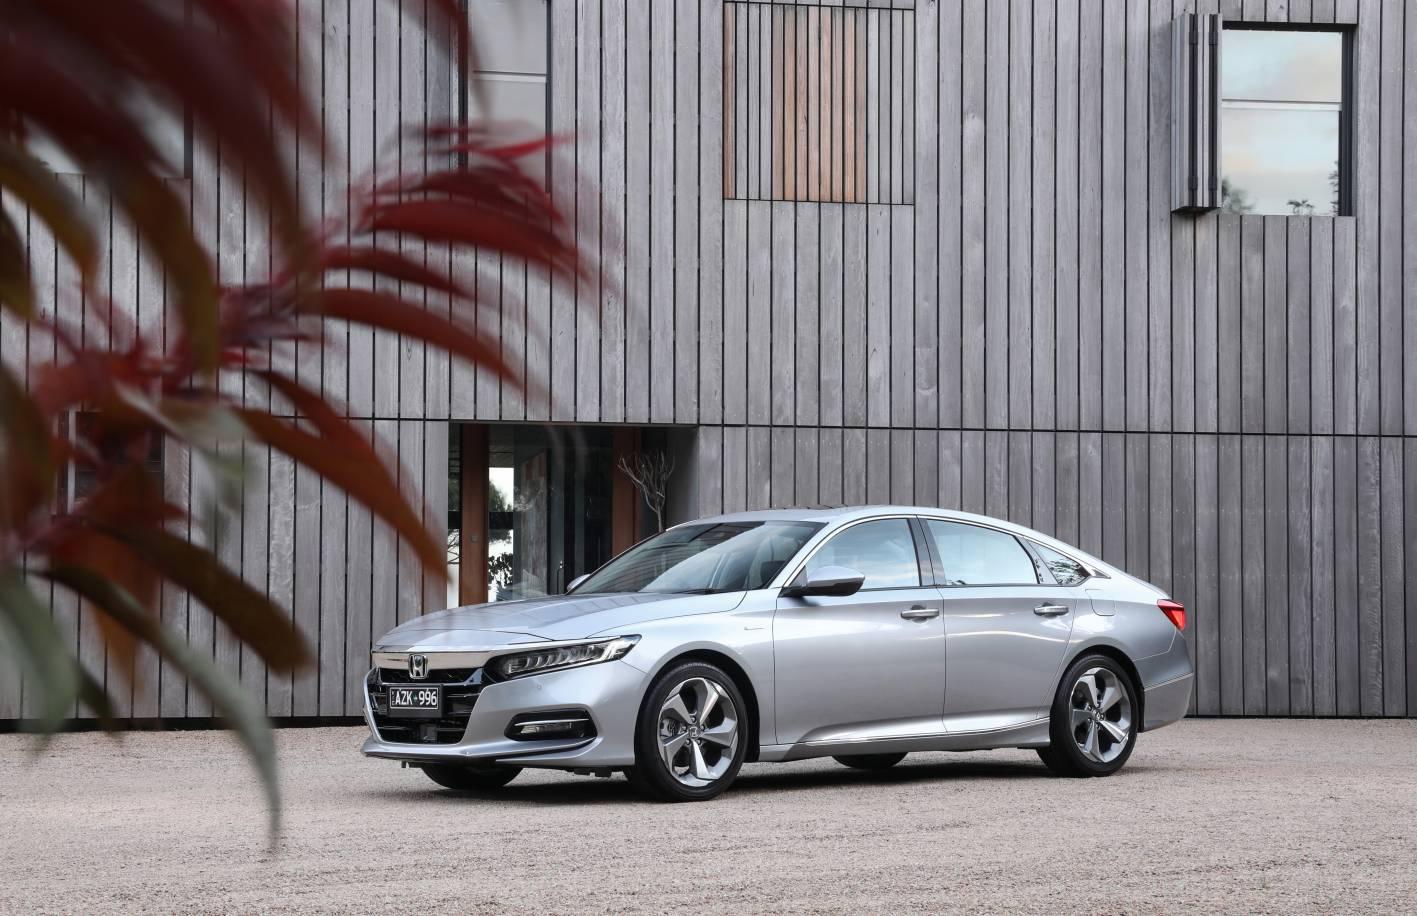 Honda's 10th generation Accord sedan soon to arrive in showrooms.